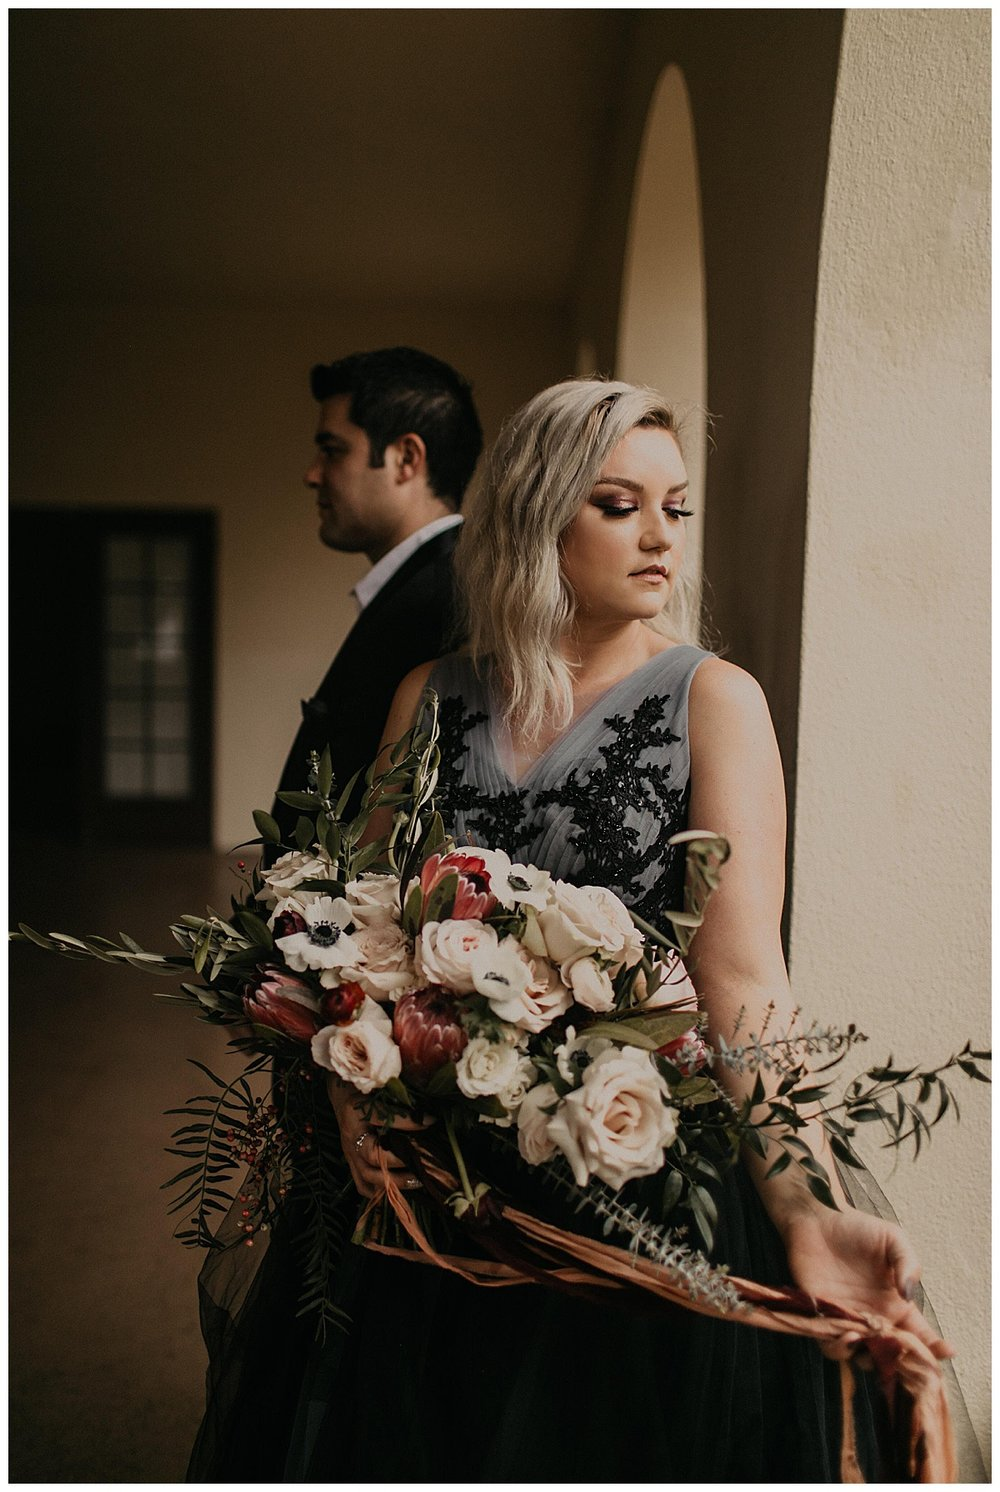 Bixby+Pine-Samantha-McFarlen-La-Jolla-Womens-Club-La-Jolla-California-Rogue-Styling_0003.jpg